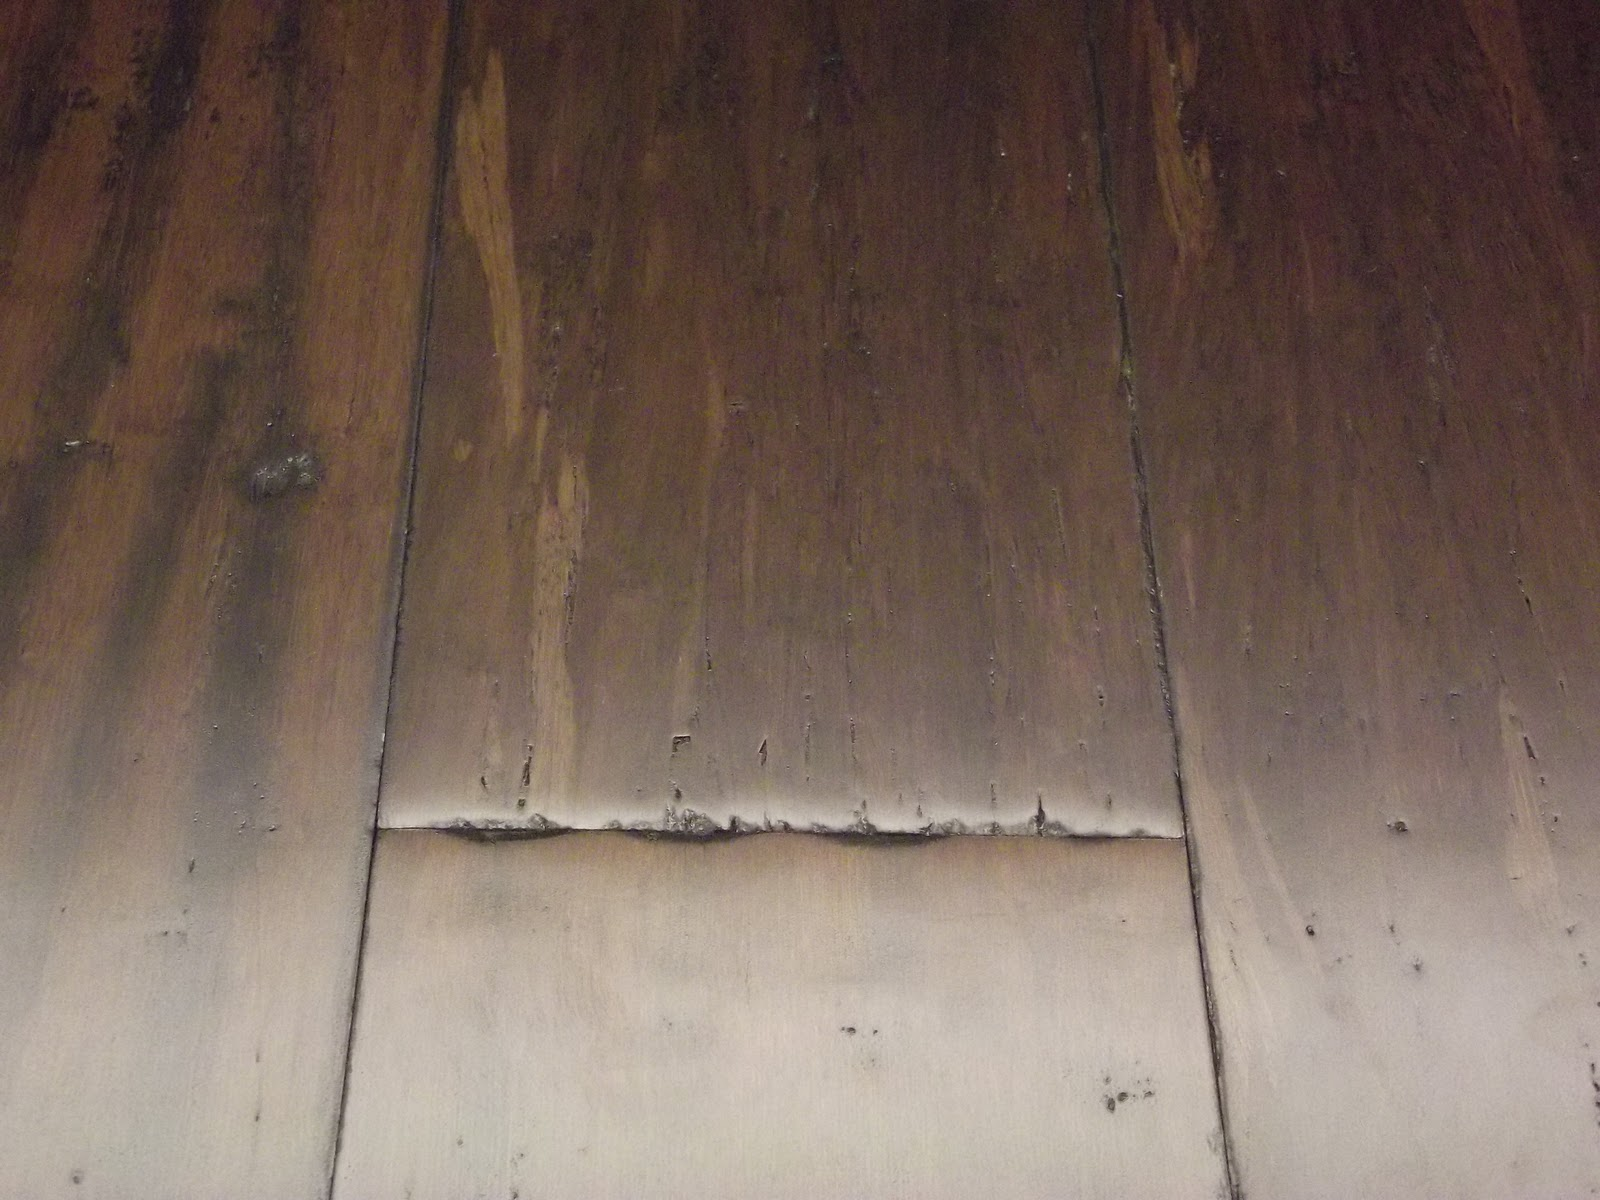 Strand Woven Bamboo Flooring Denver Co